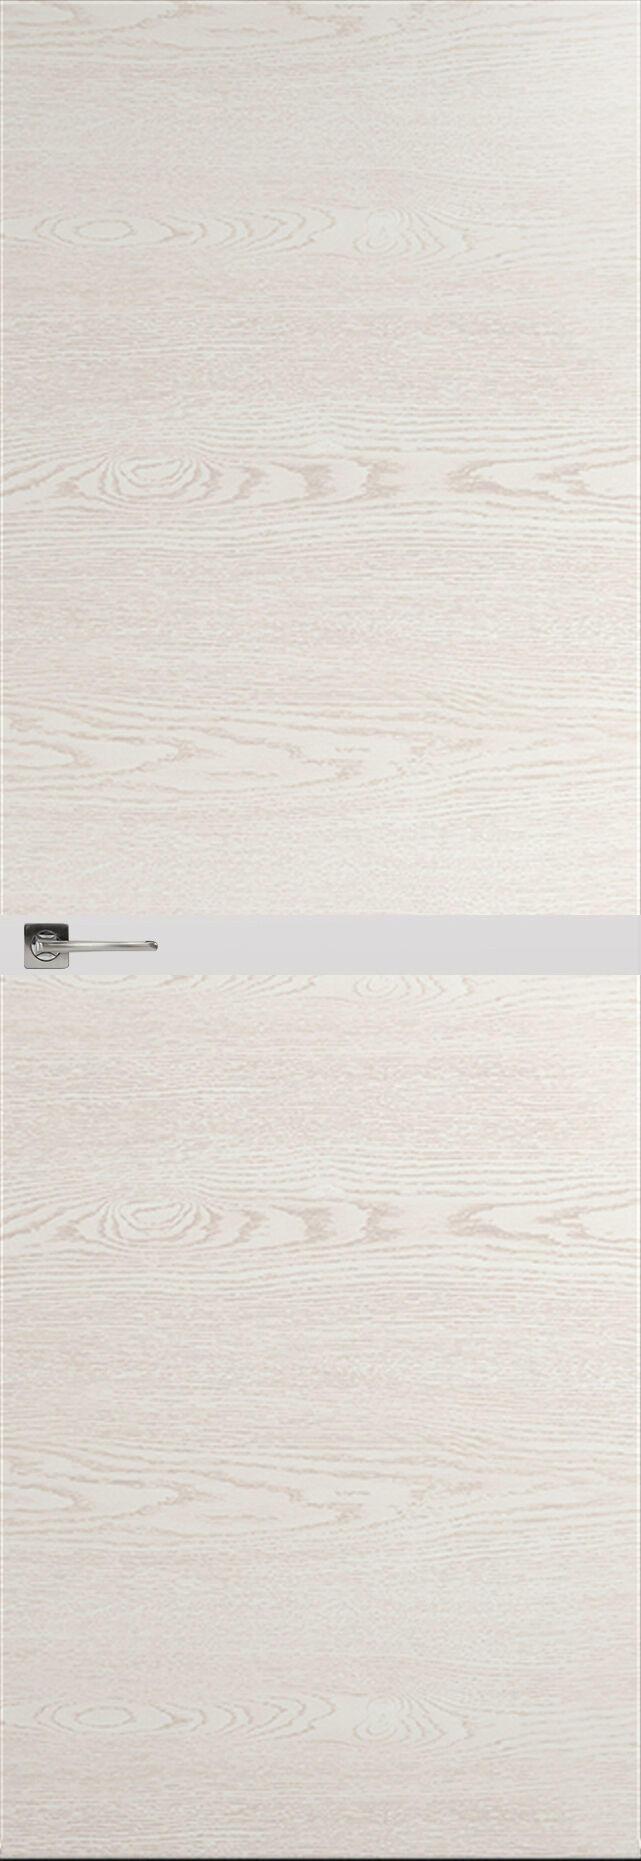 Tivoli Б-4 Невидимка цвет - Белый ясень Без стекла (ДГ)